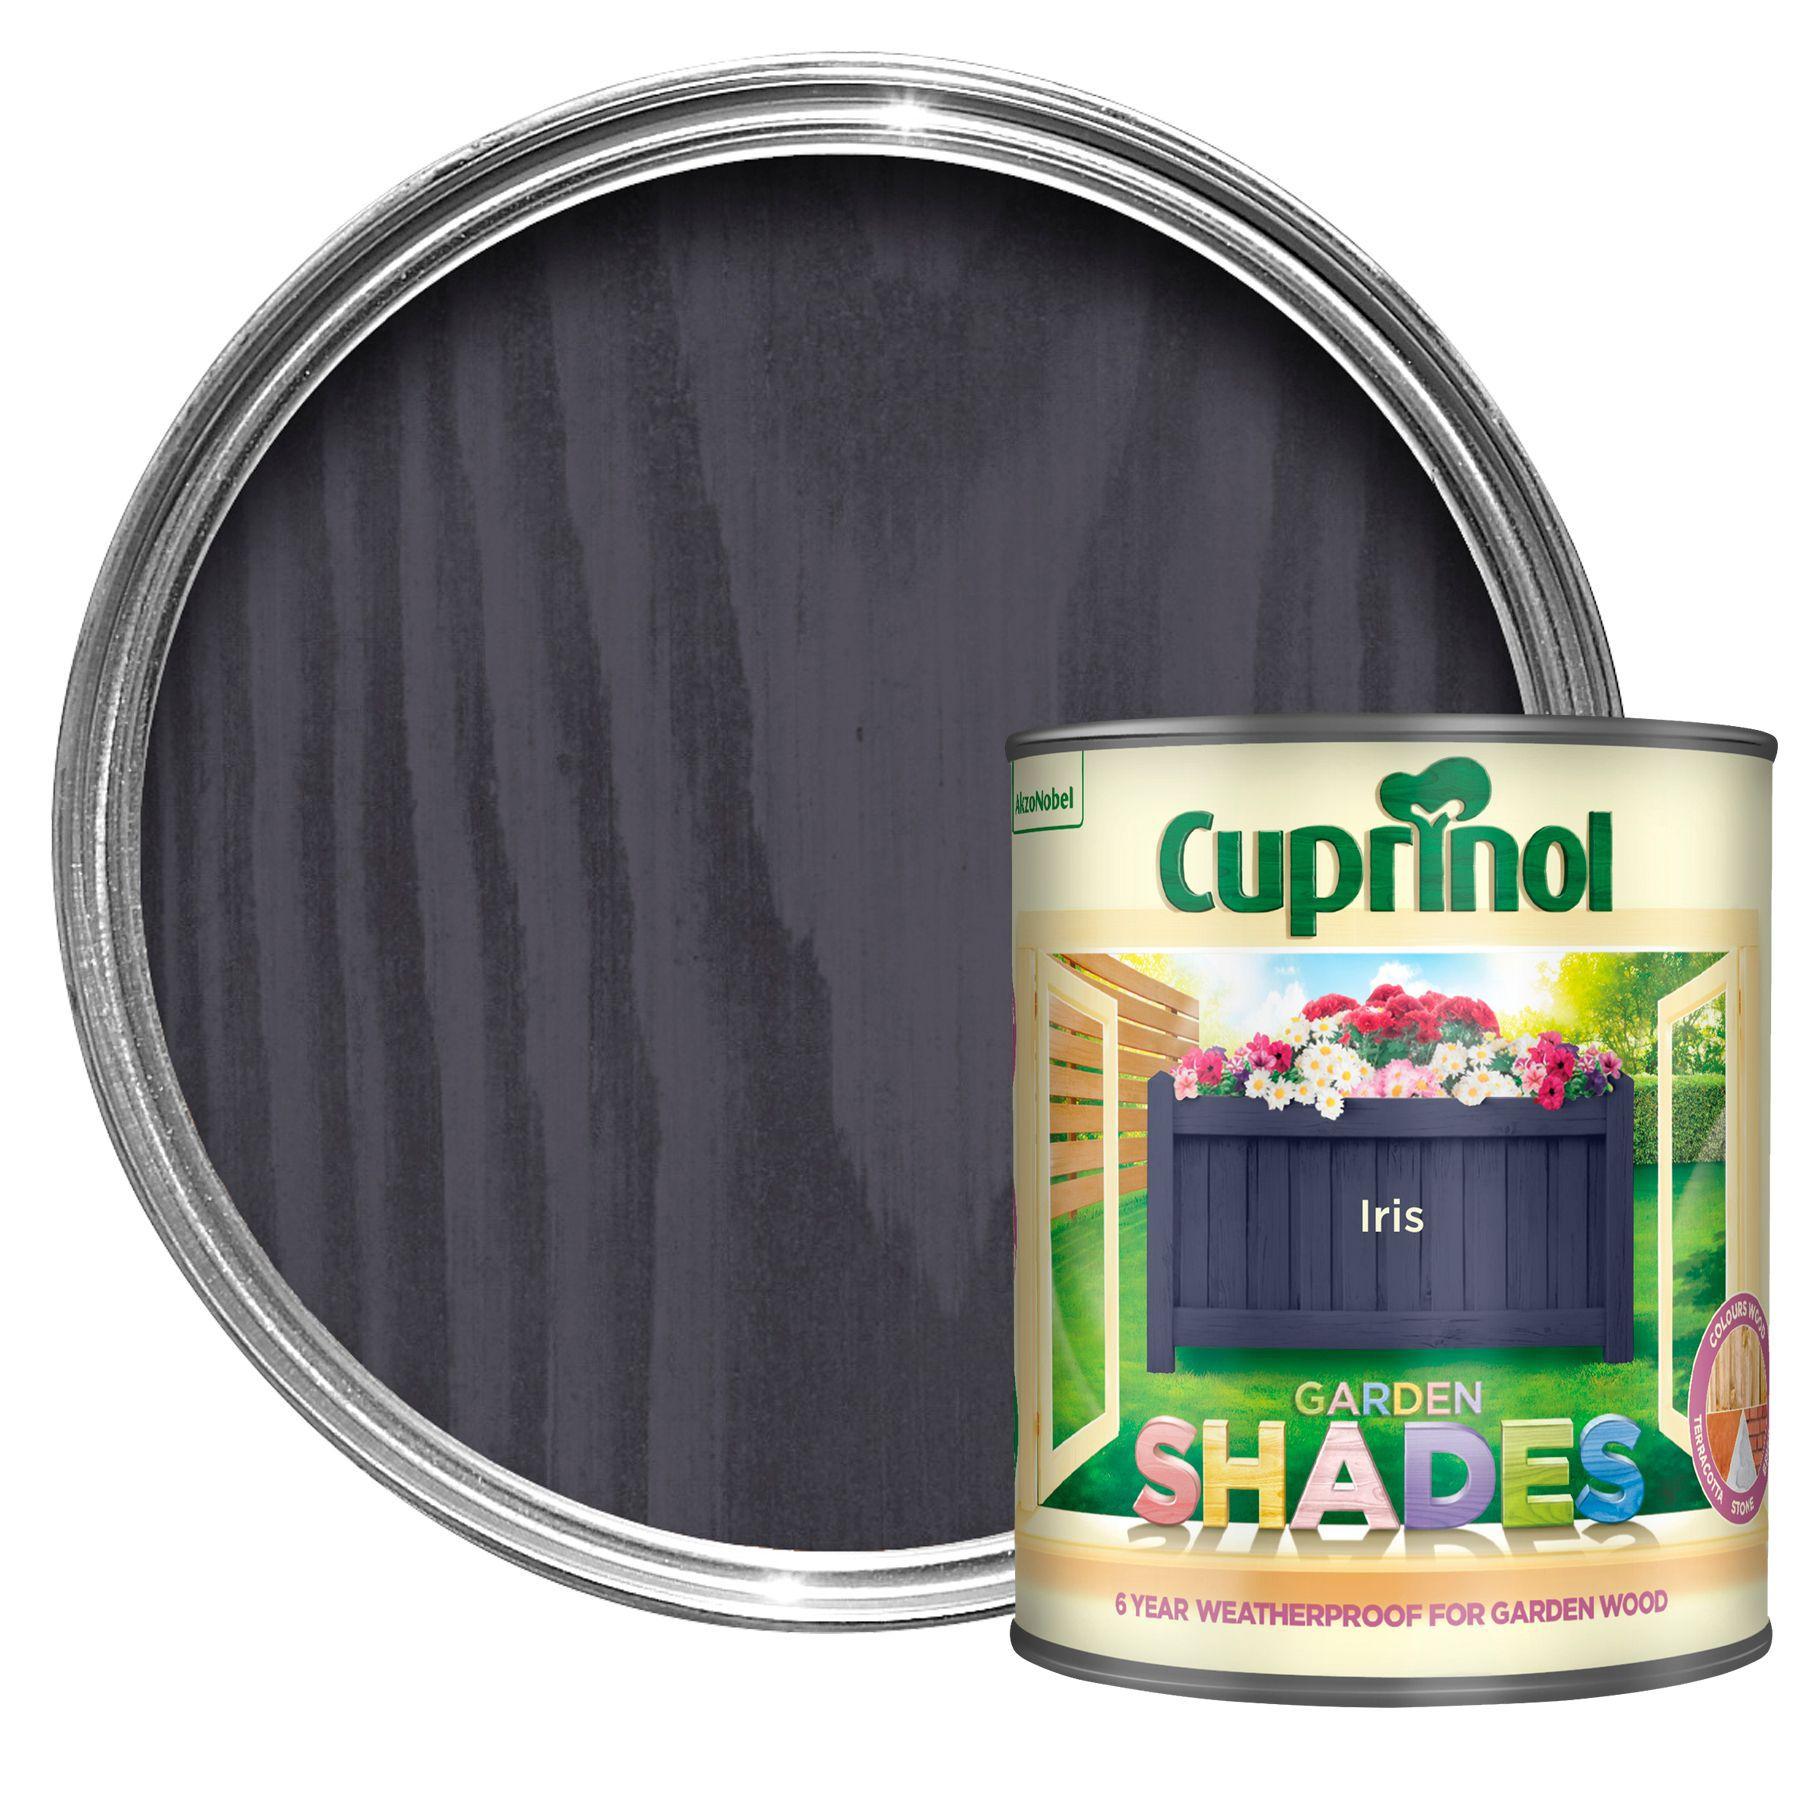 Cuprinol Garden Shades Iris Matt Wood Paint 1l Departments Diy At B Q